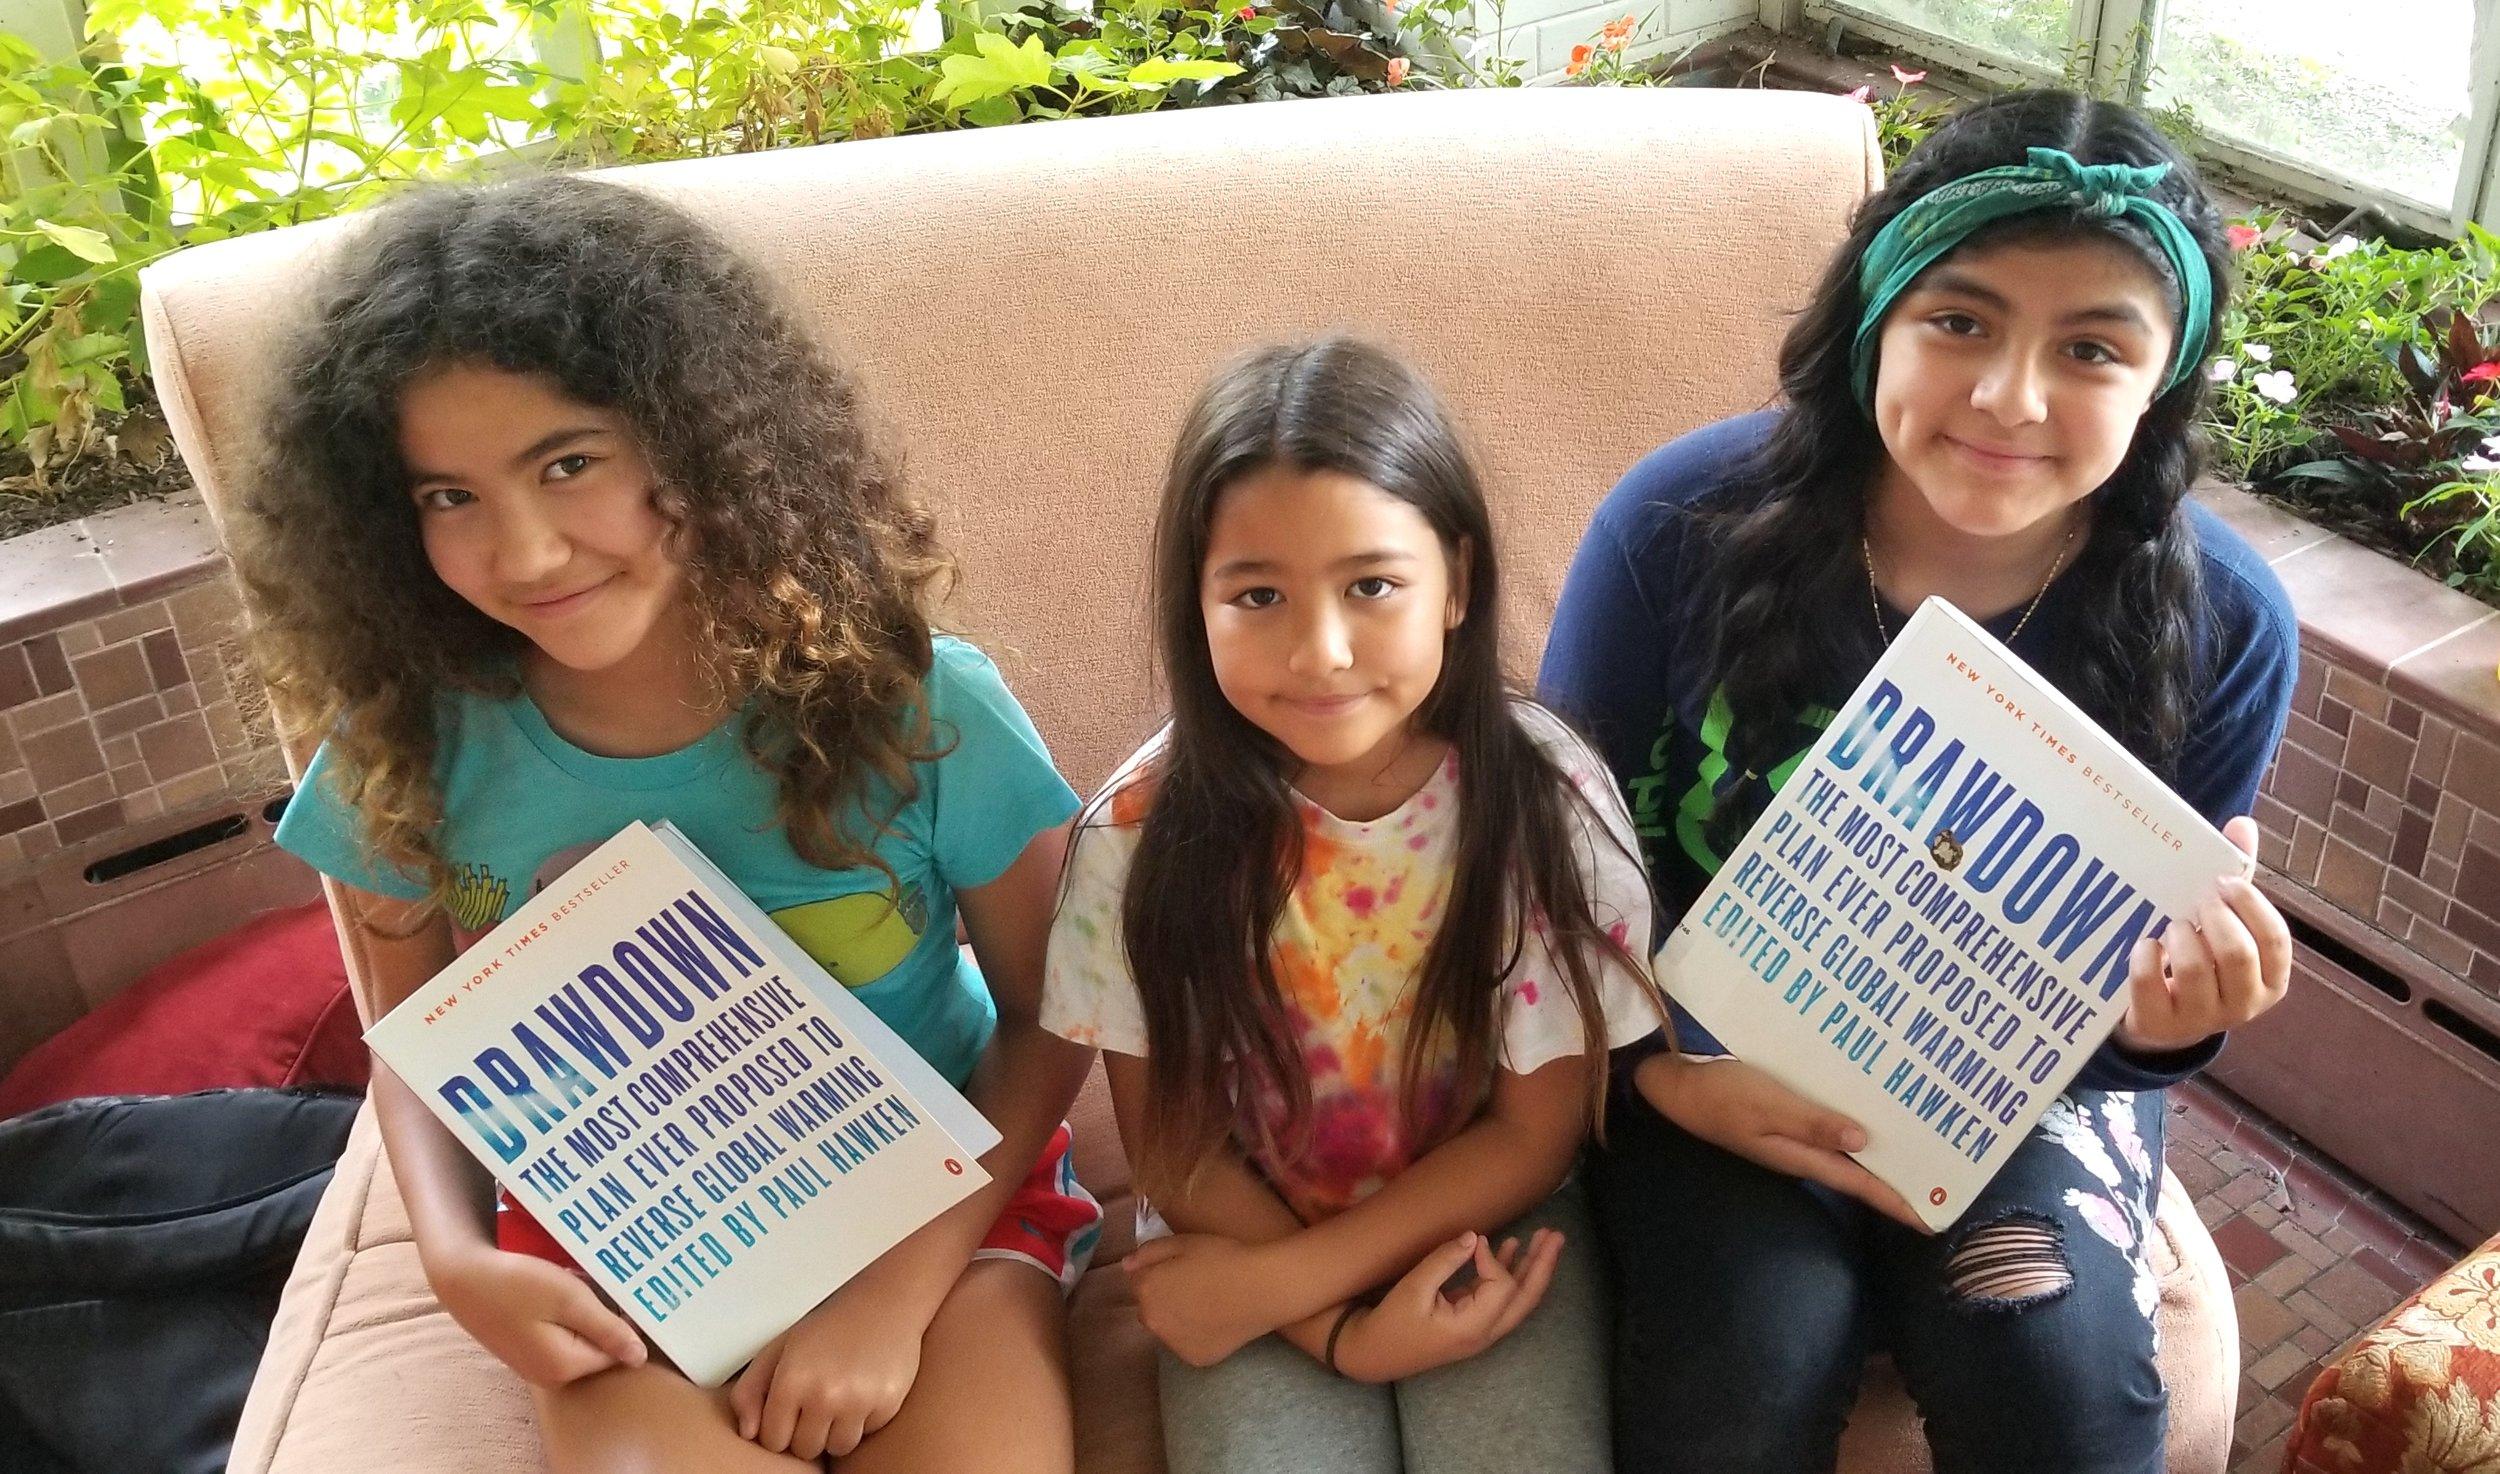 Hikari, Inori and Julianna study Drawdown at Climate Camp, July, 2018.